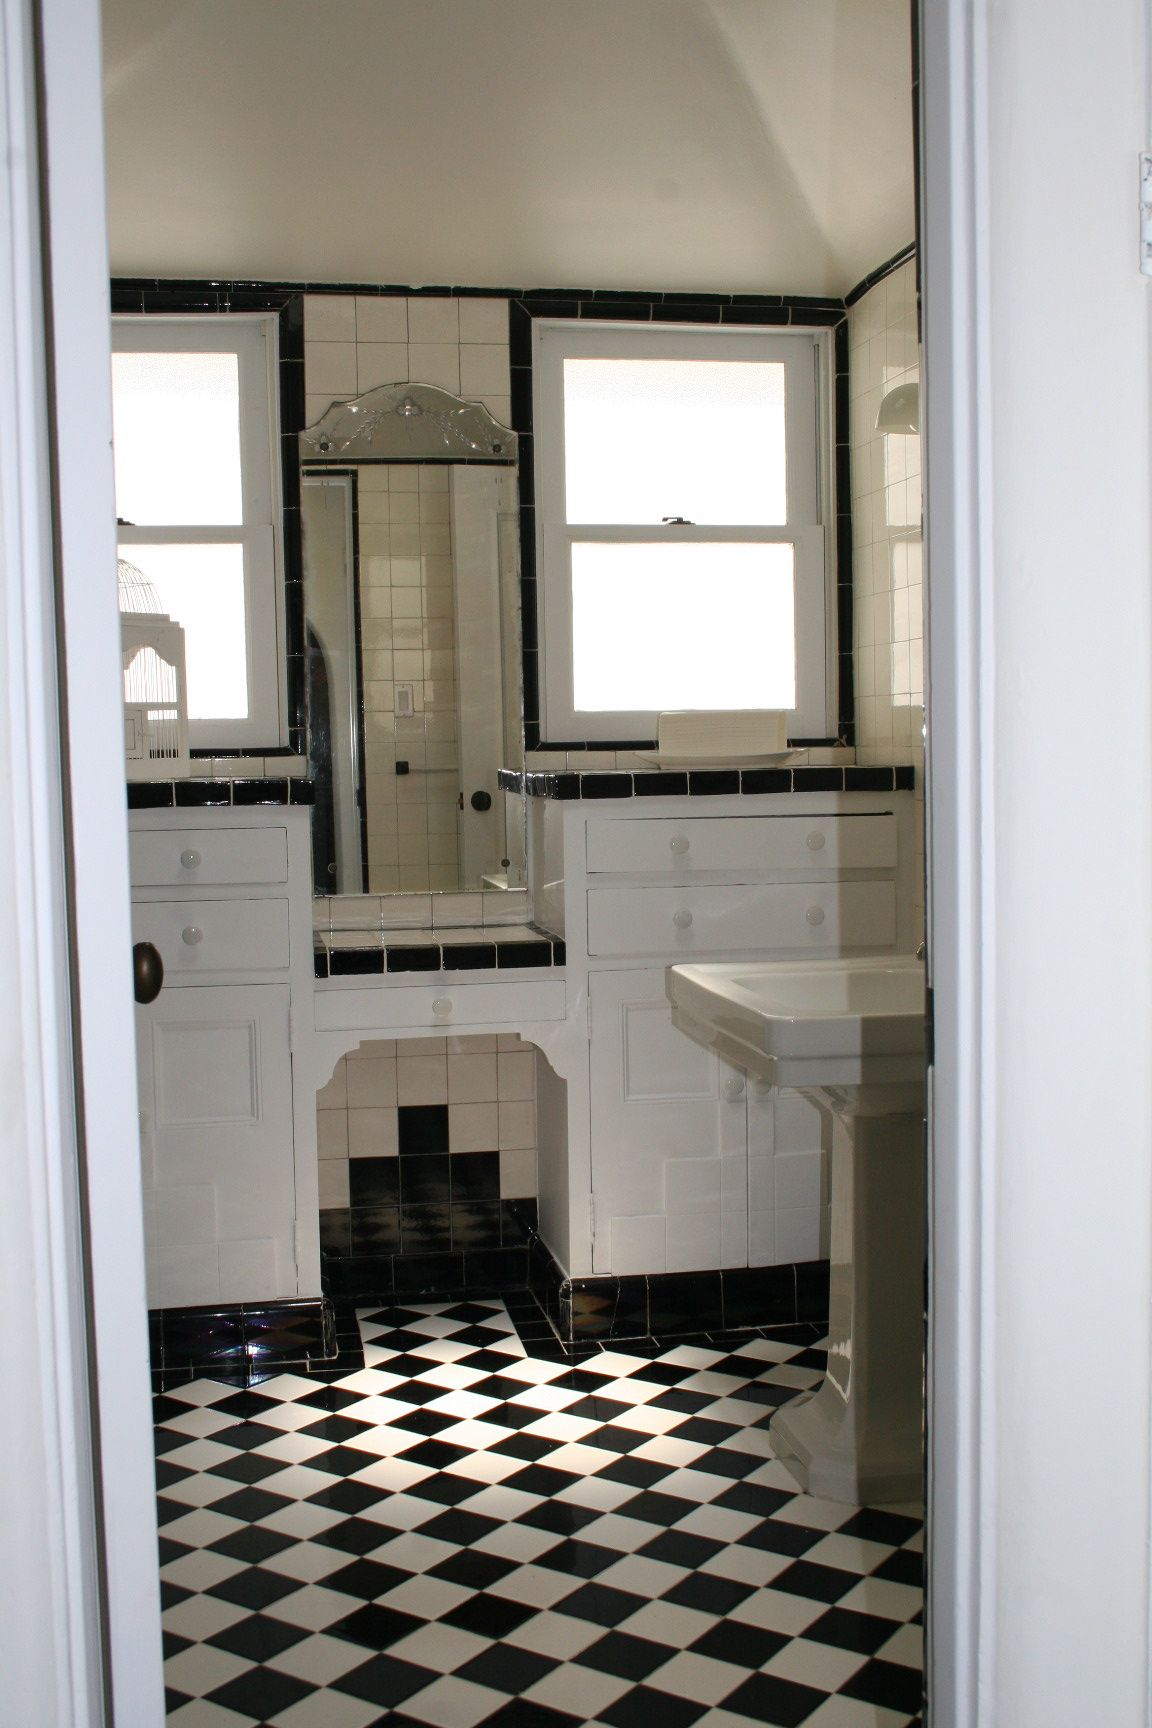 Restored Tile Bathroom In 1920' Spanish Home